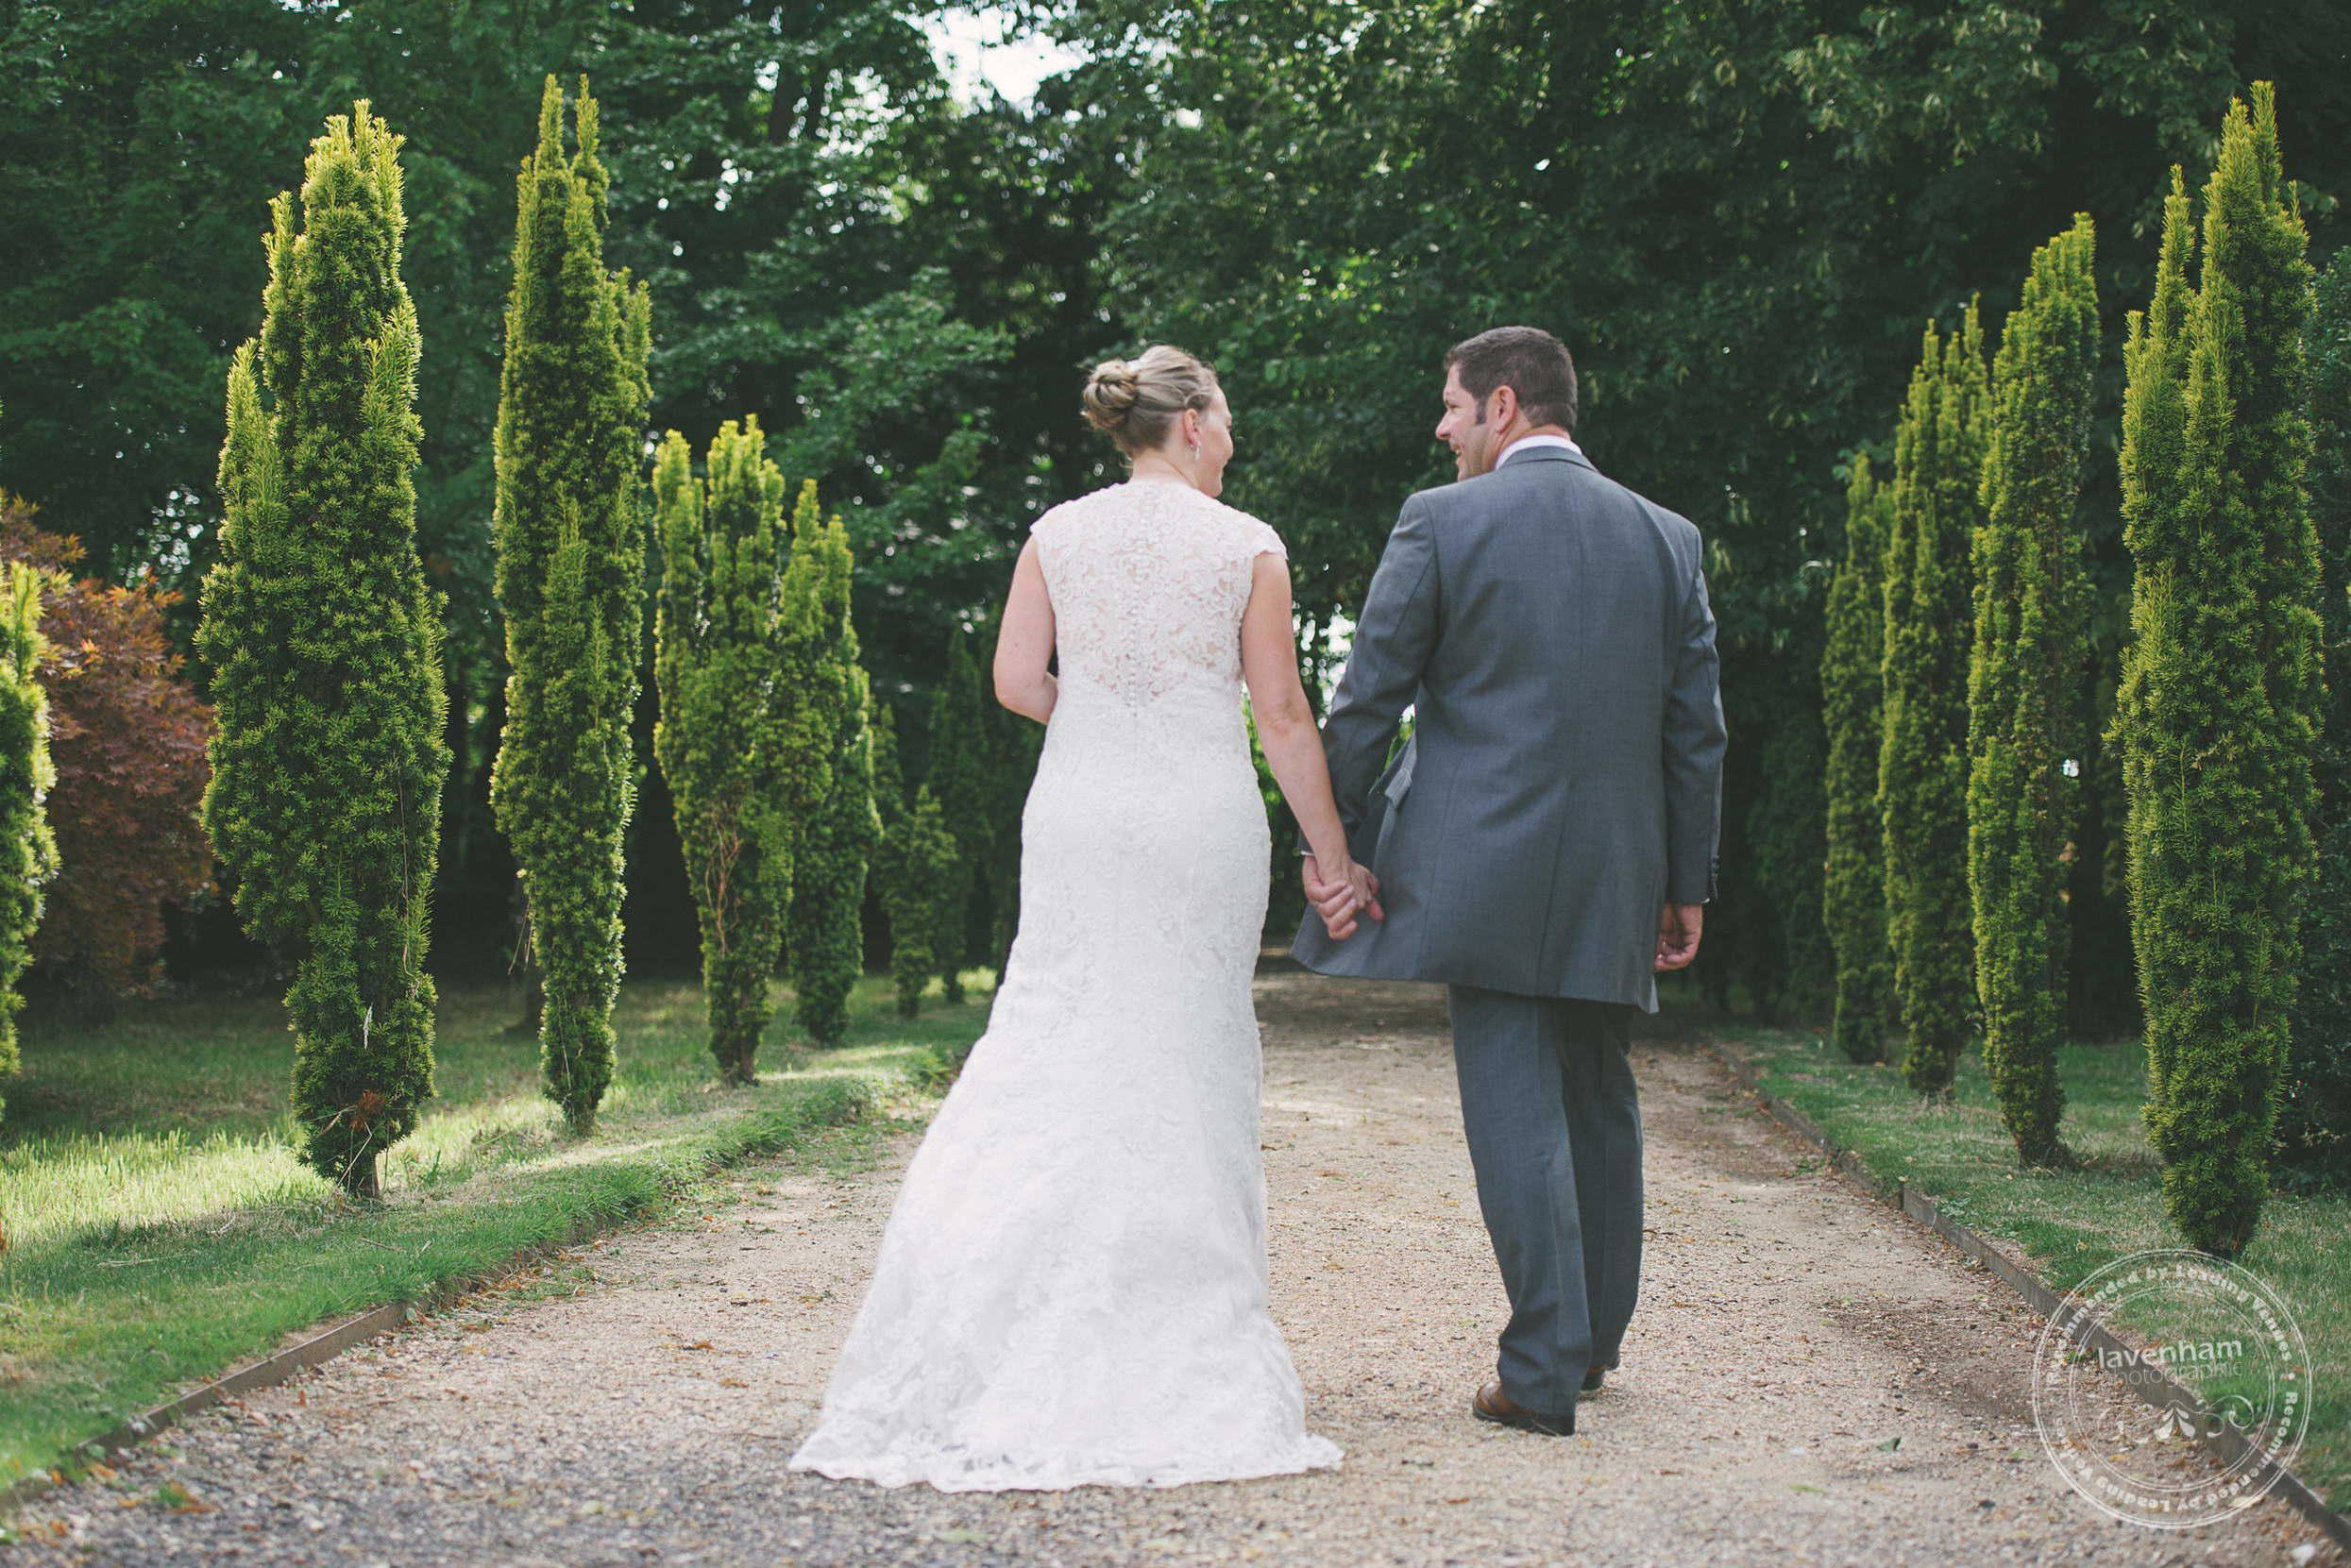 180715-kentwell-hall-wedding-photographer-025